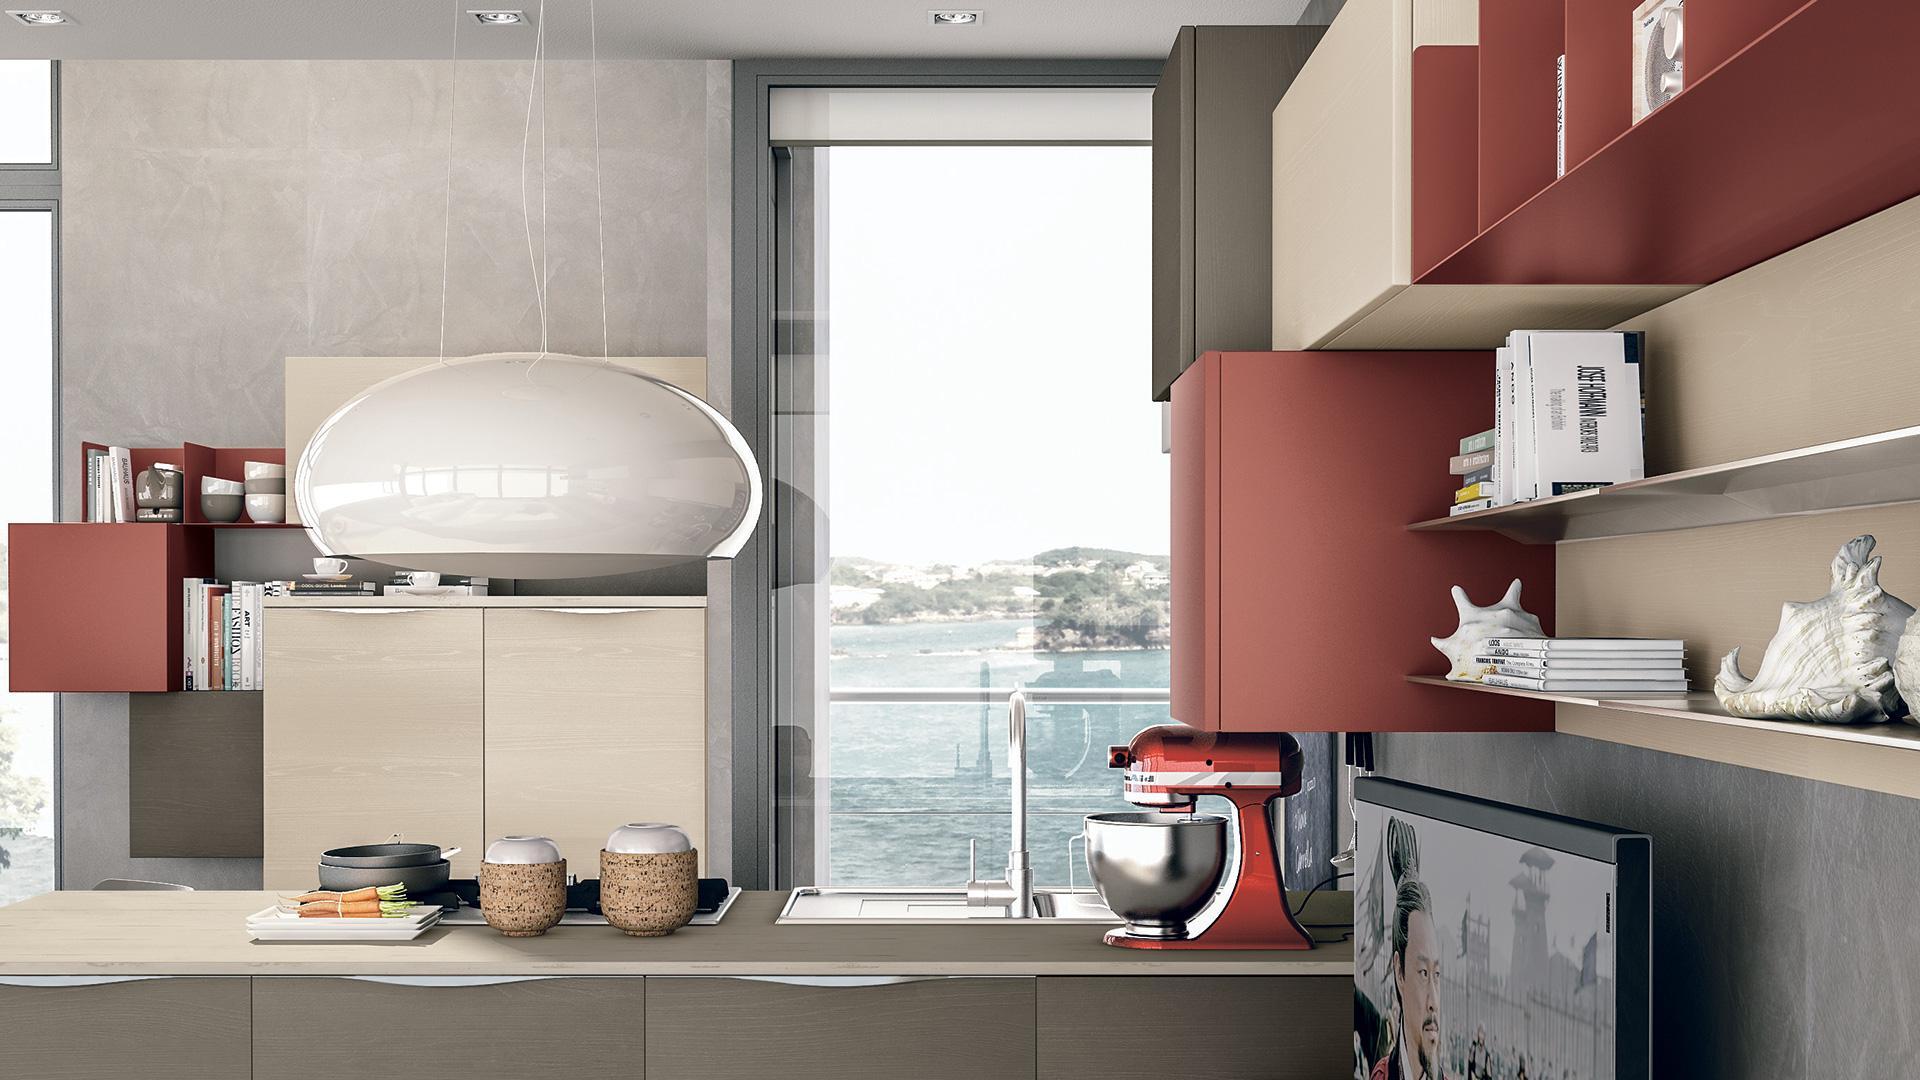 Cucina Immagina - Lube Cucine Reggio Emilia >Cucina >Modena >Parma